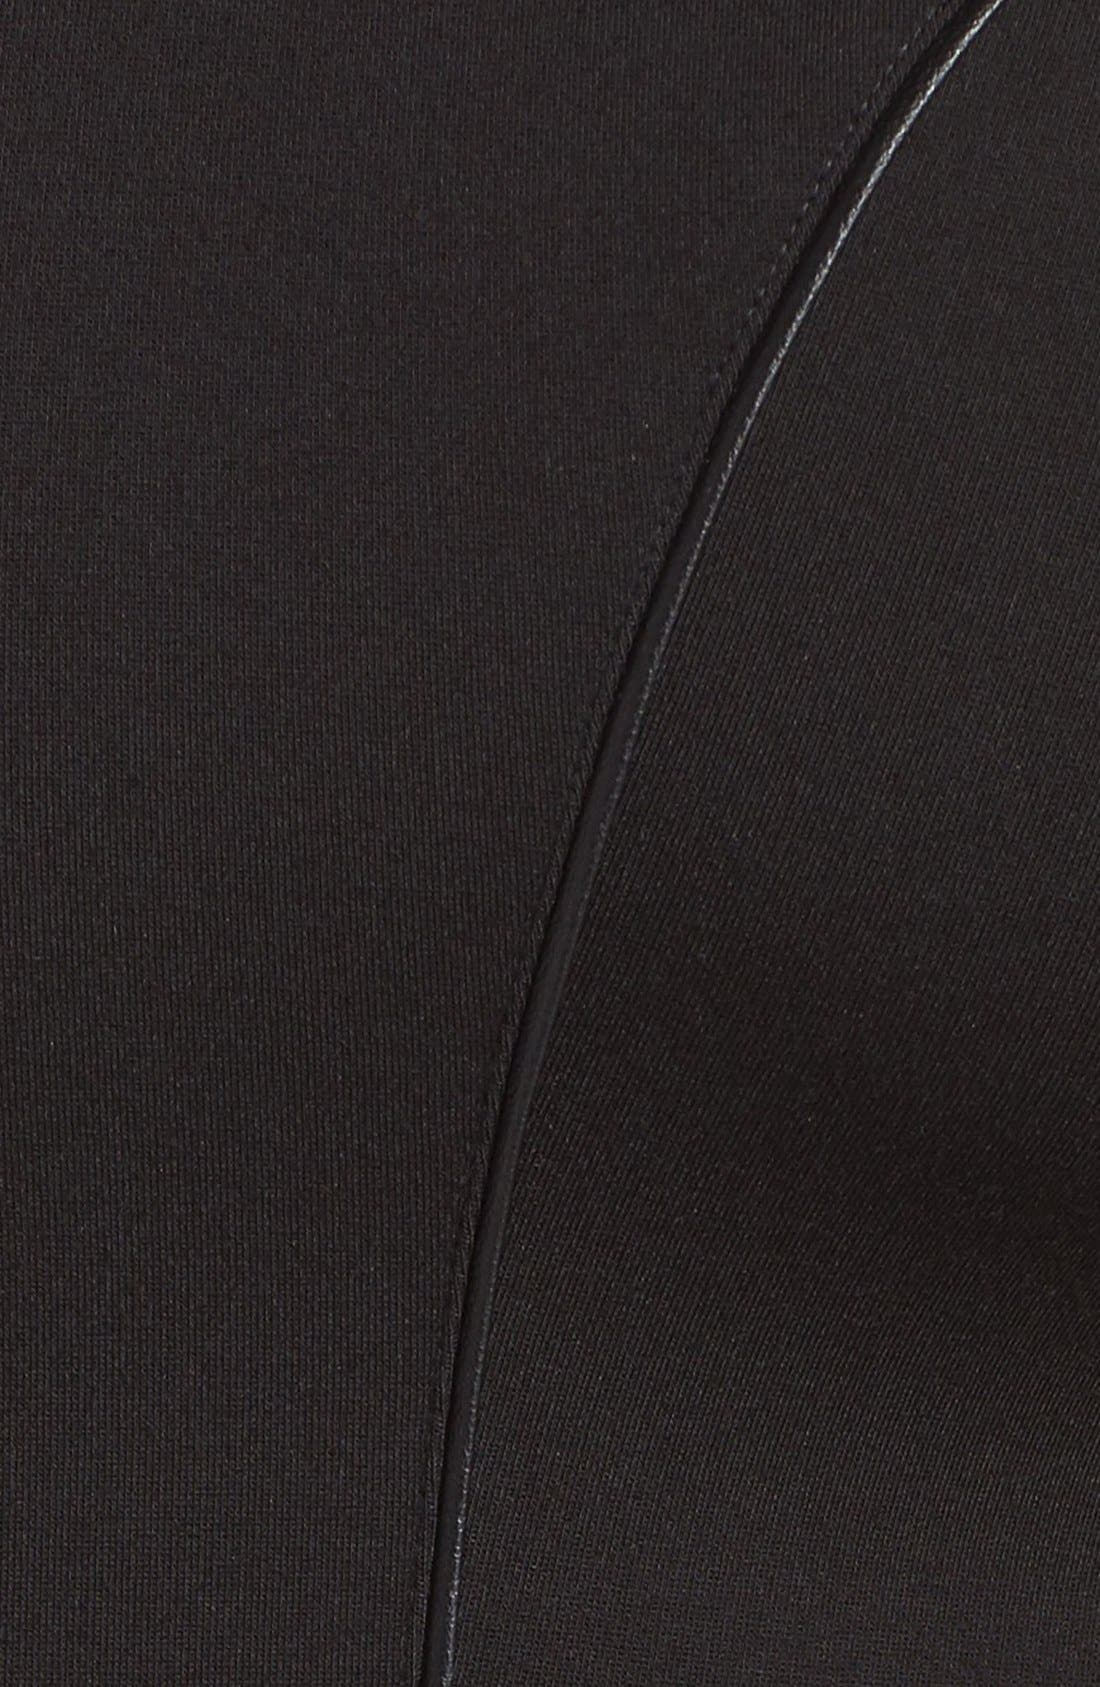 'Viera' Piped Detail V-Neck Sheath Dress,                             Alternate thumbnail 14, color,